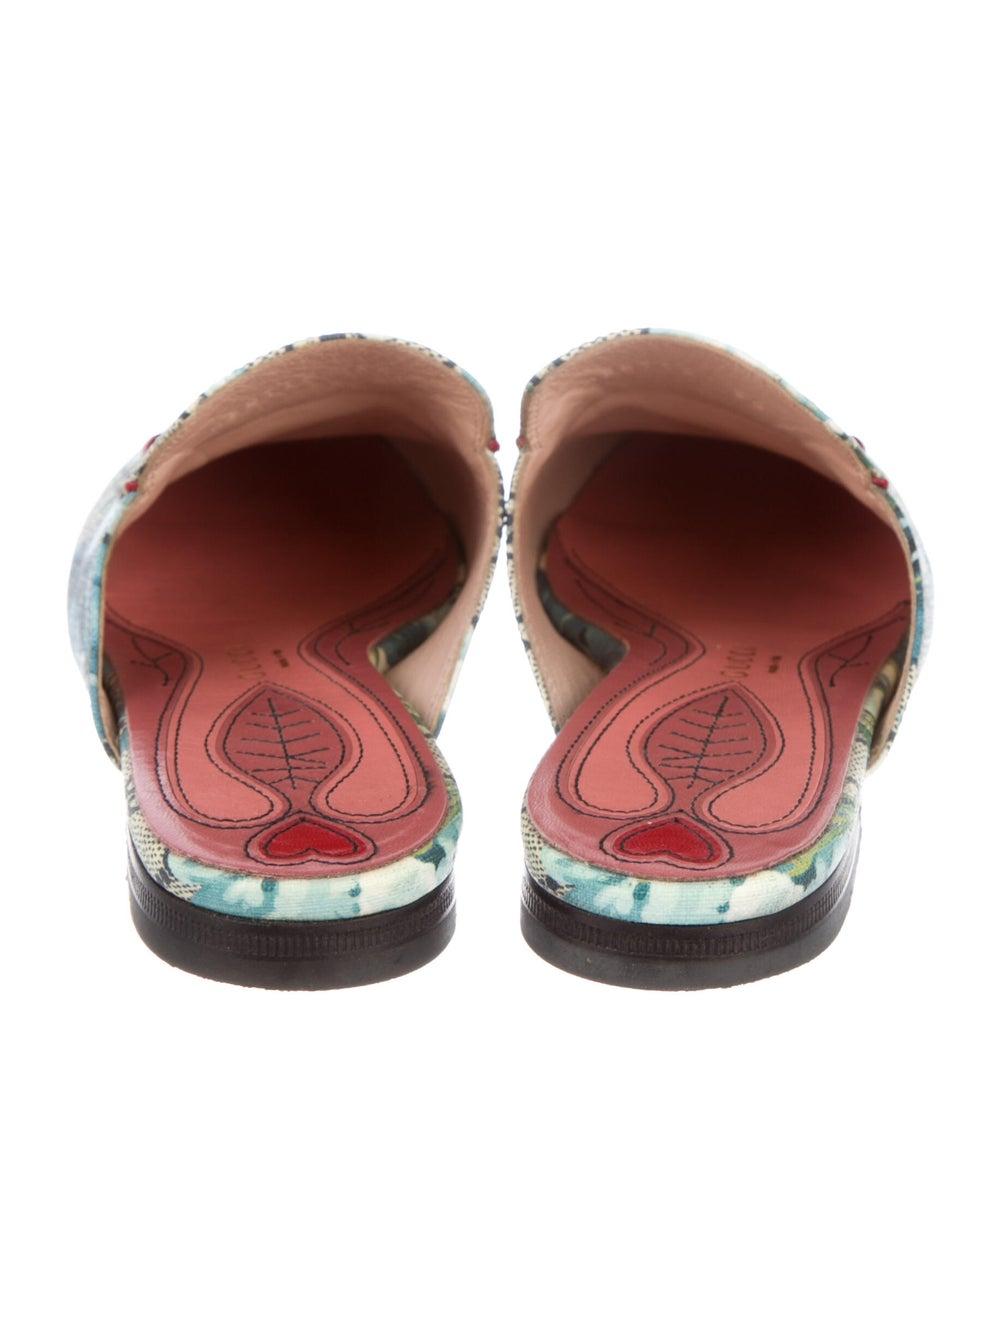 Gucci Princetown Horsebit Accent Mules - image 4